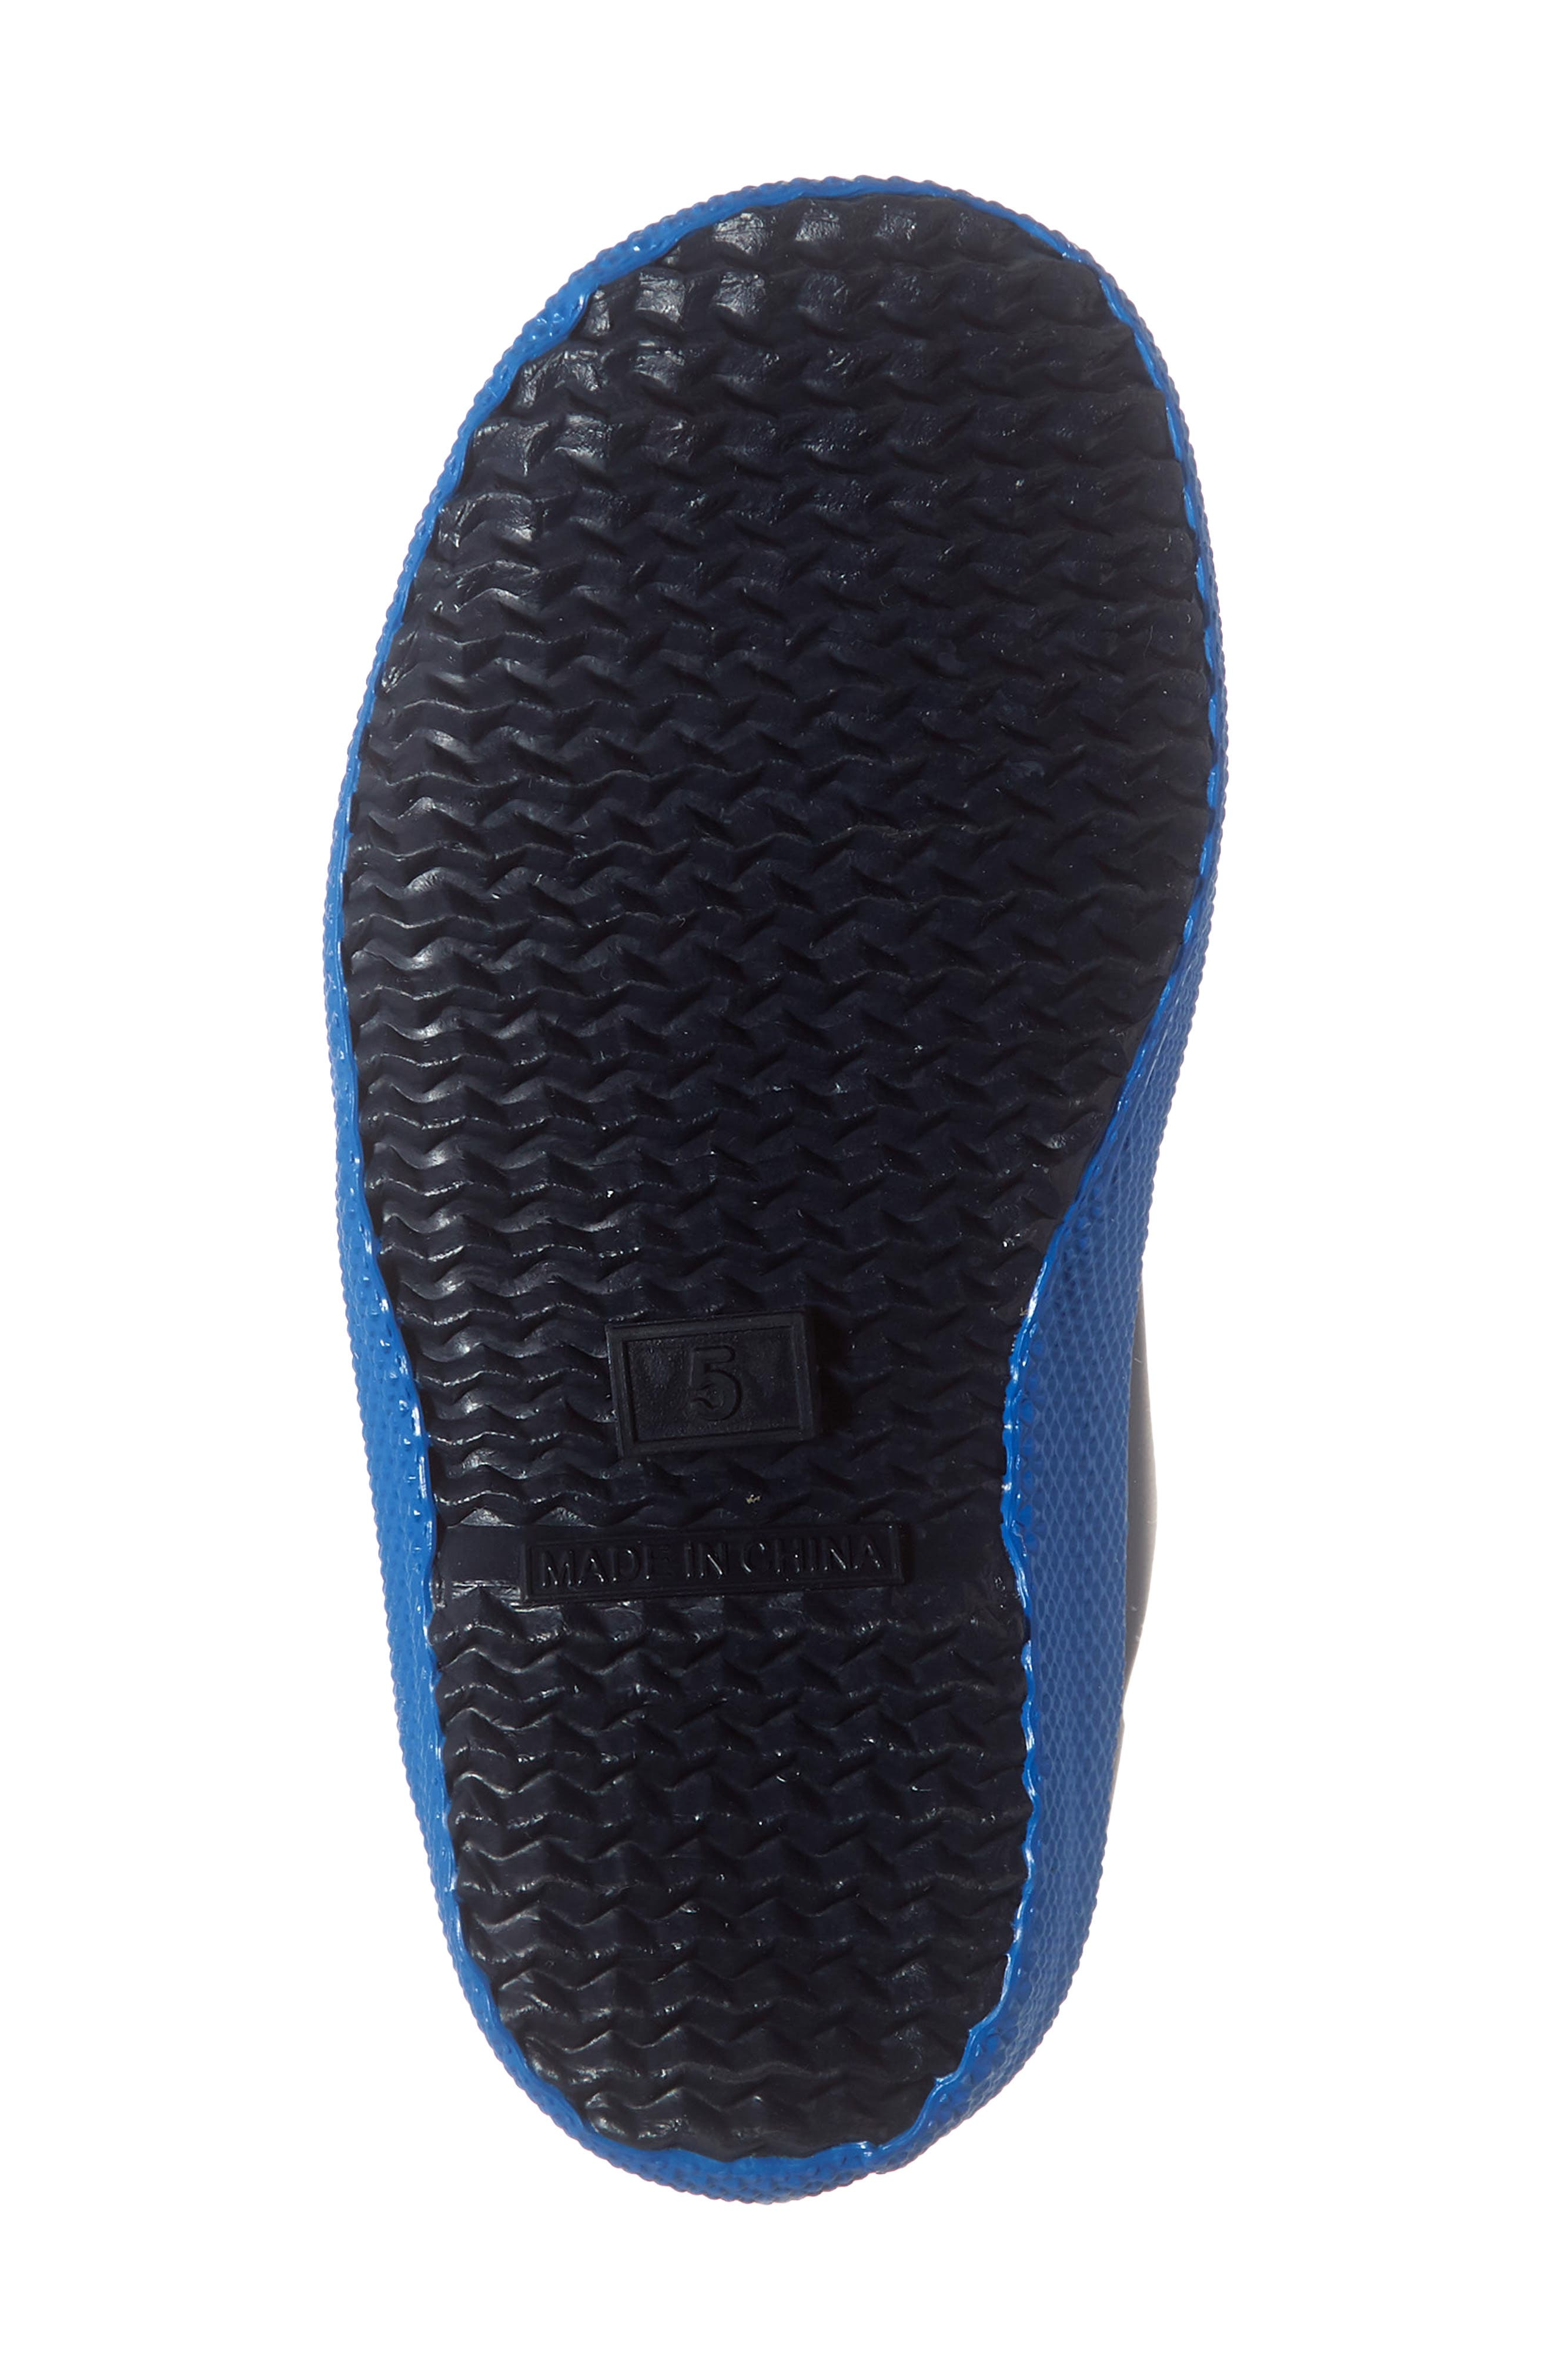 HUNTER,                             First Classic Waterproof Rain Boot,                             Alternate thumbnail 6, color,                             GULL GREY/ BUCKET BLUE/ NAVY